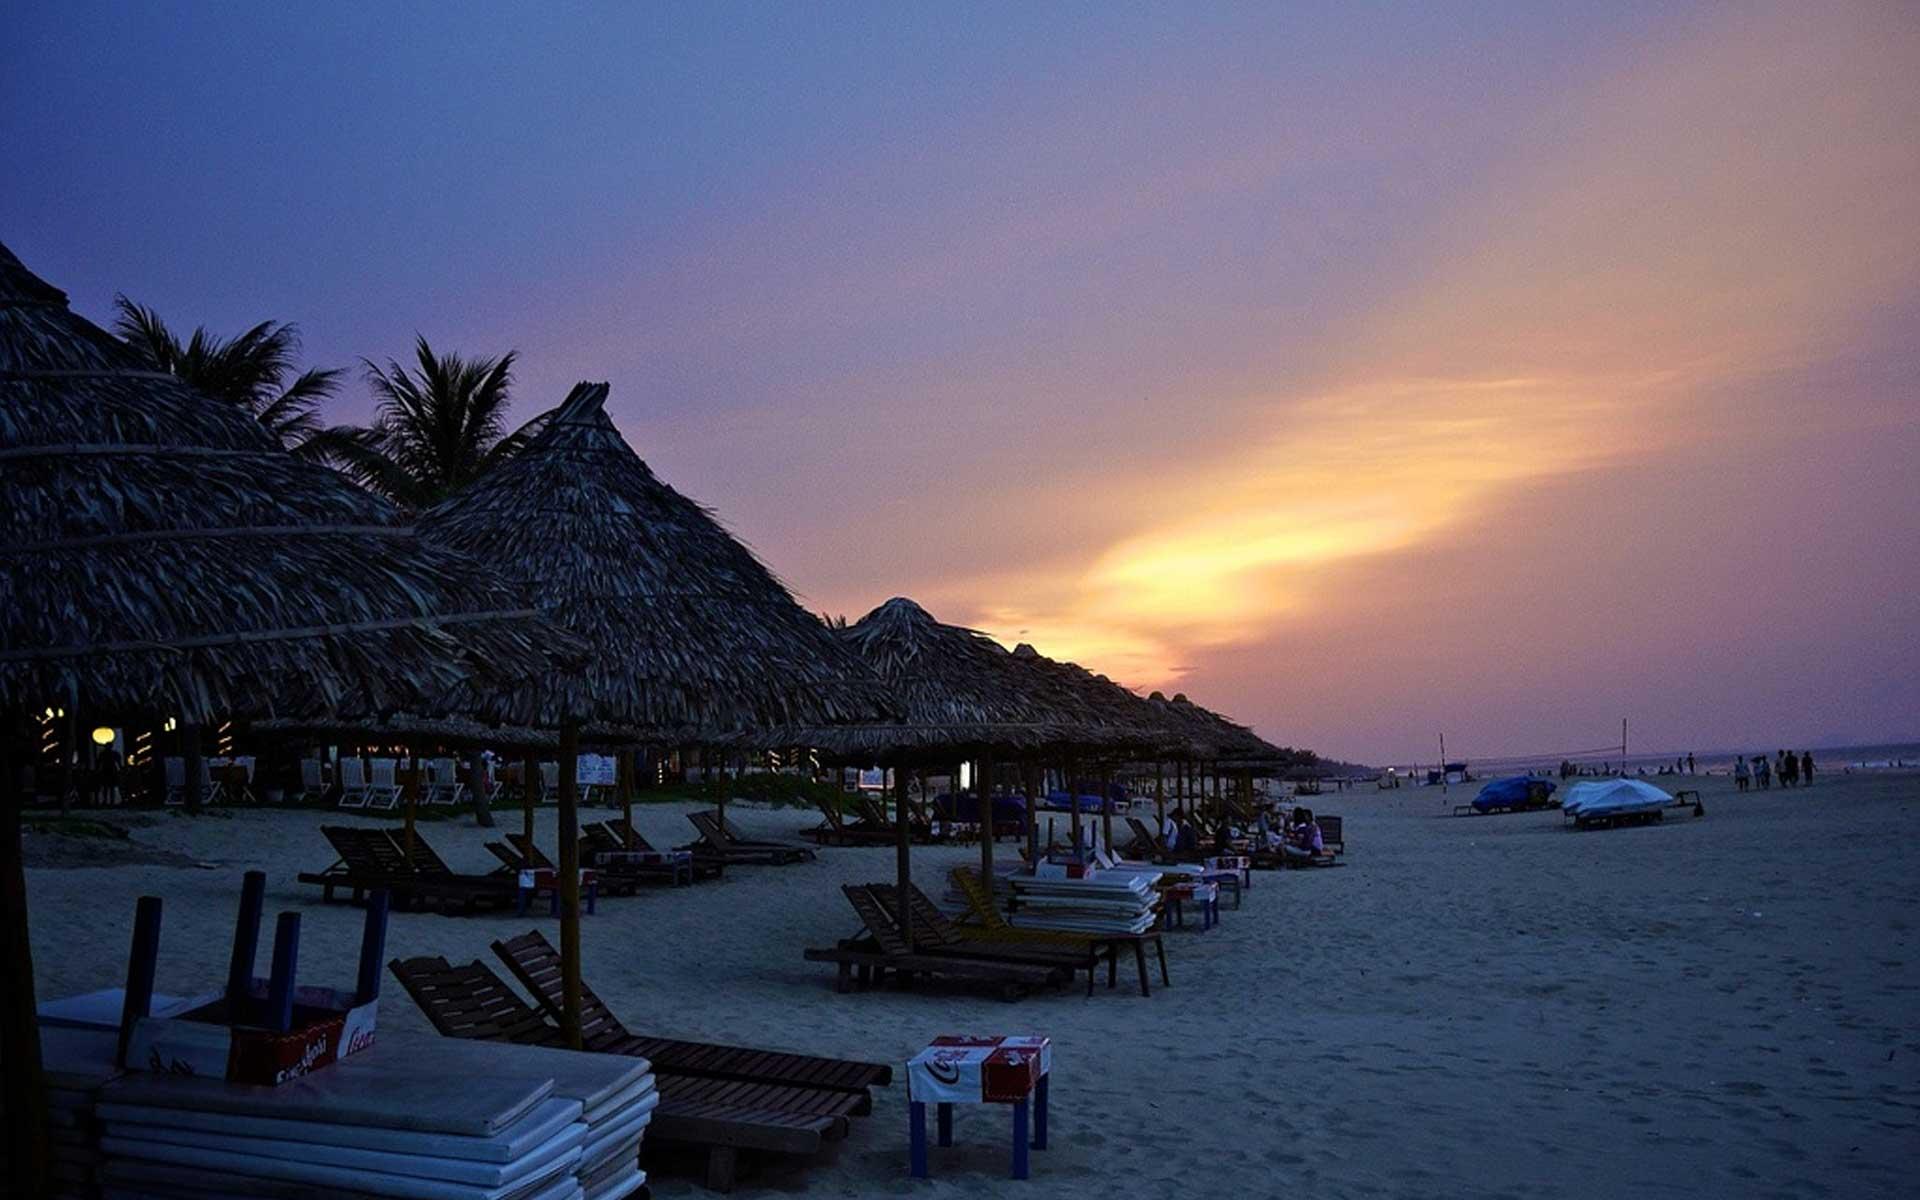 Enjoying Cua Dai beach at night